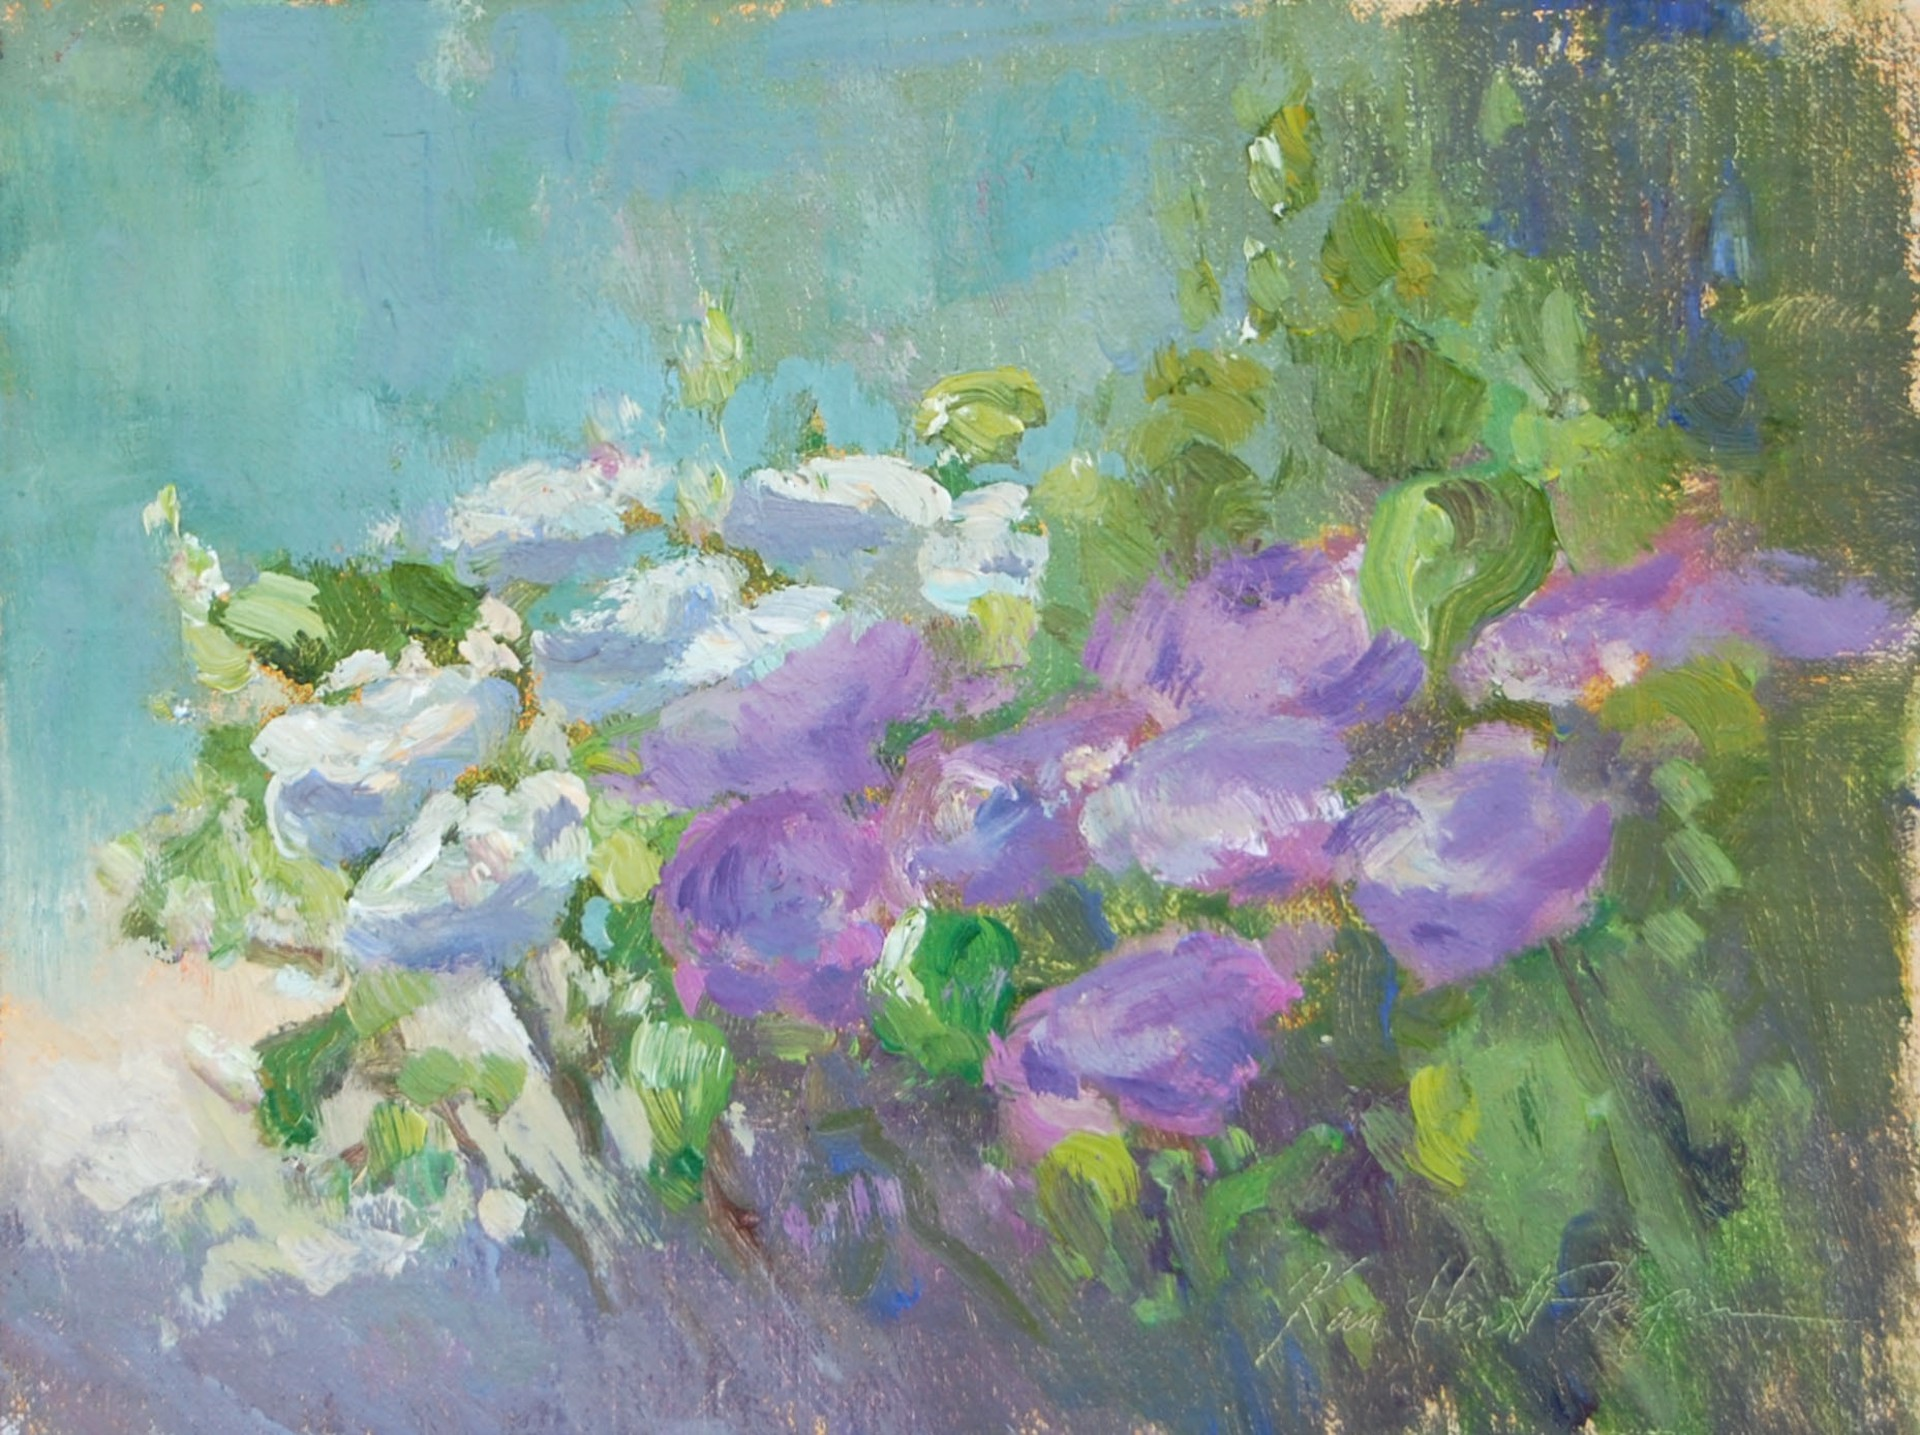 Flowers in the Garden, Tuscany by Karen Hewitt Hagan